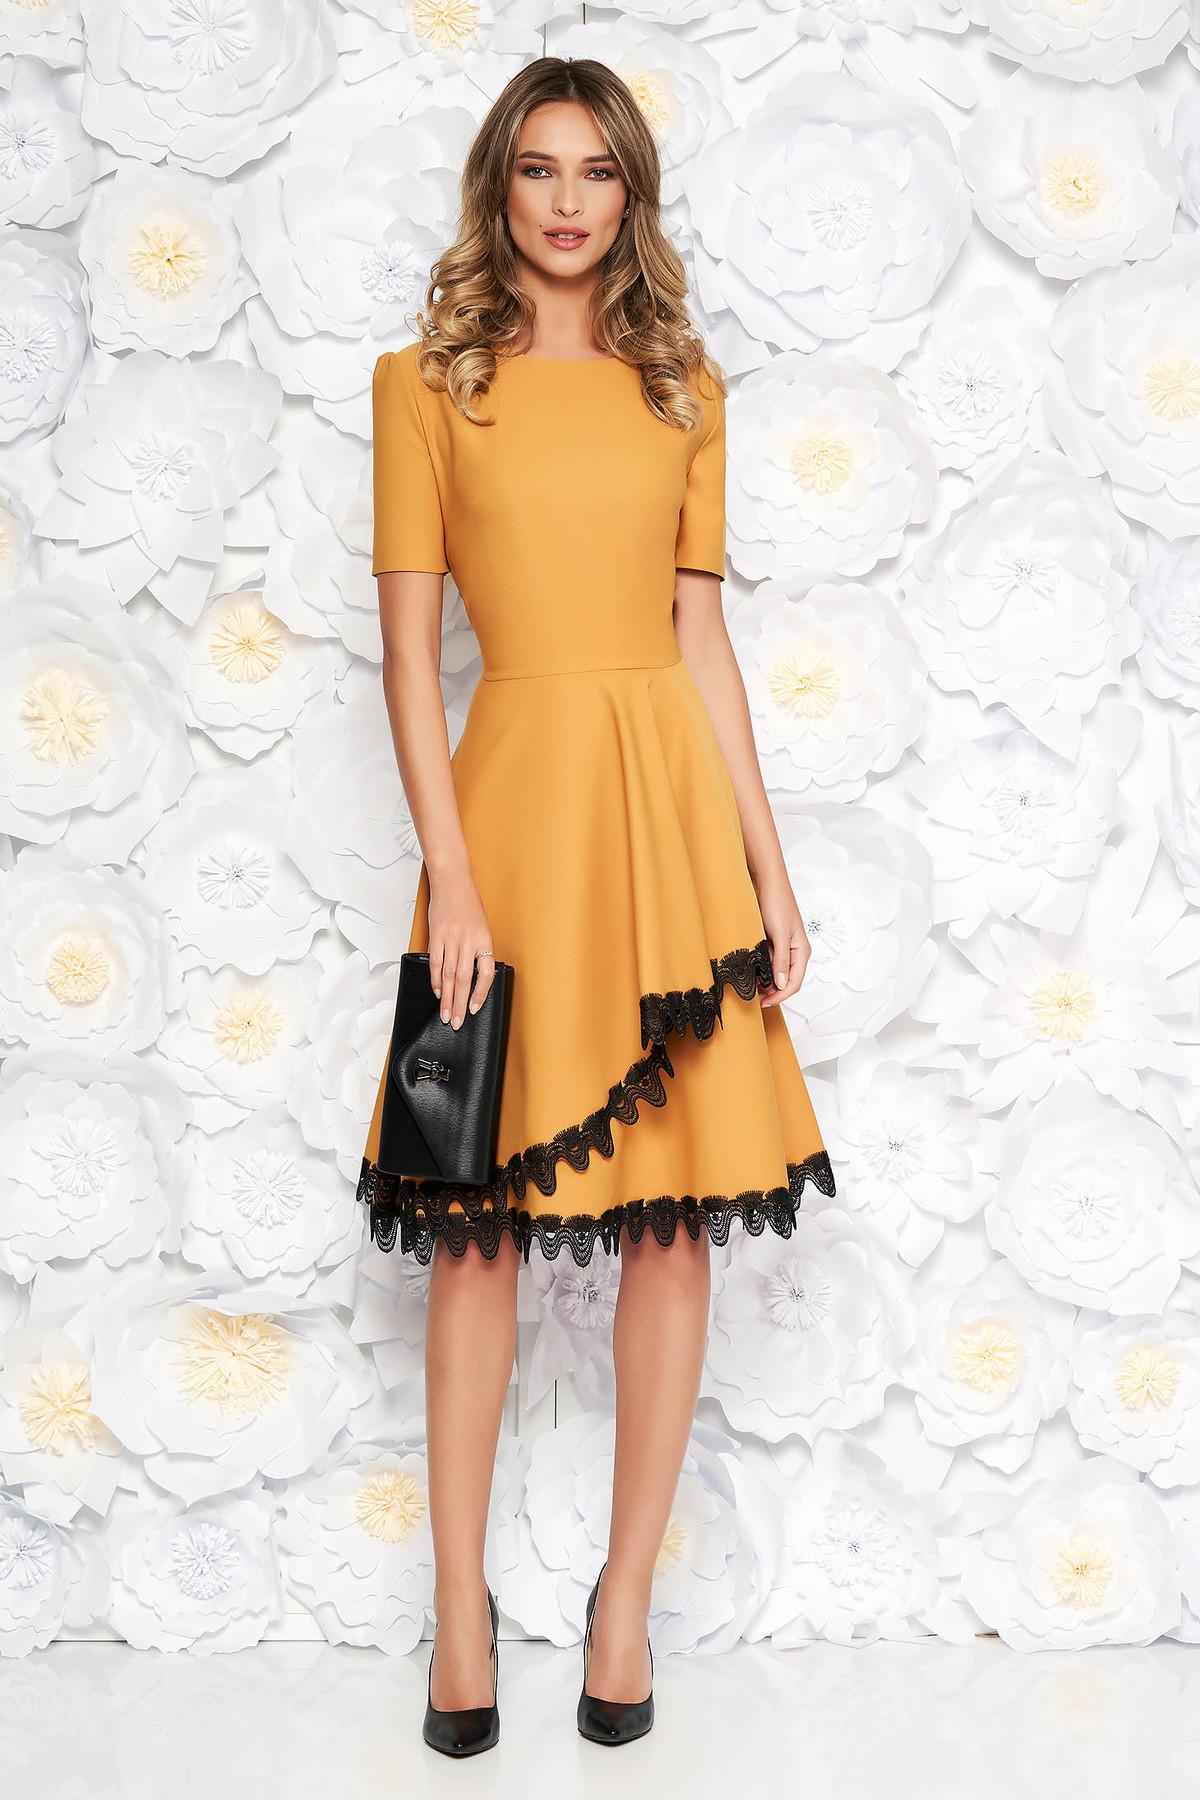 Rochie mustarie eleganta midi in clos din stofa elastica subtire cu volanase cu aplicatii de dantela